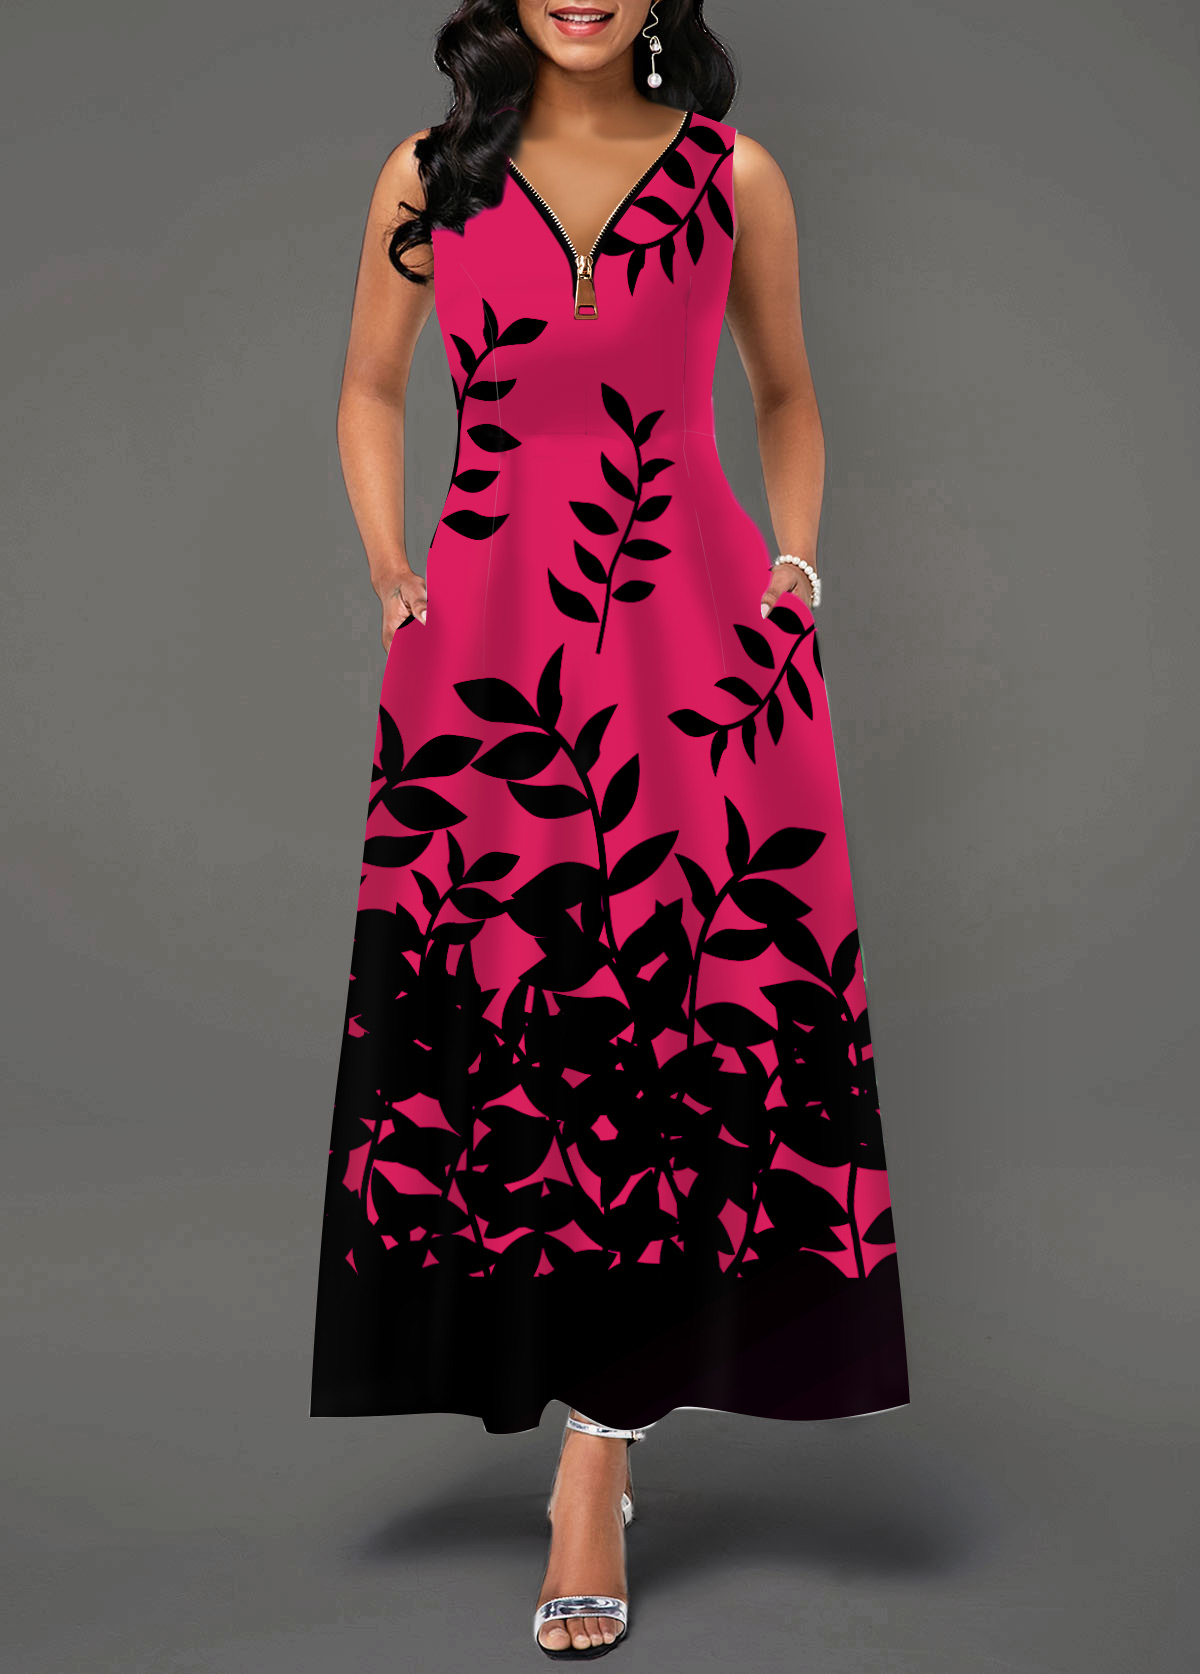 Sleeveless Leaf Print Zipper Detail Maxi Dress